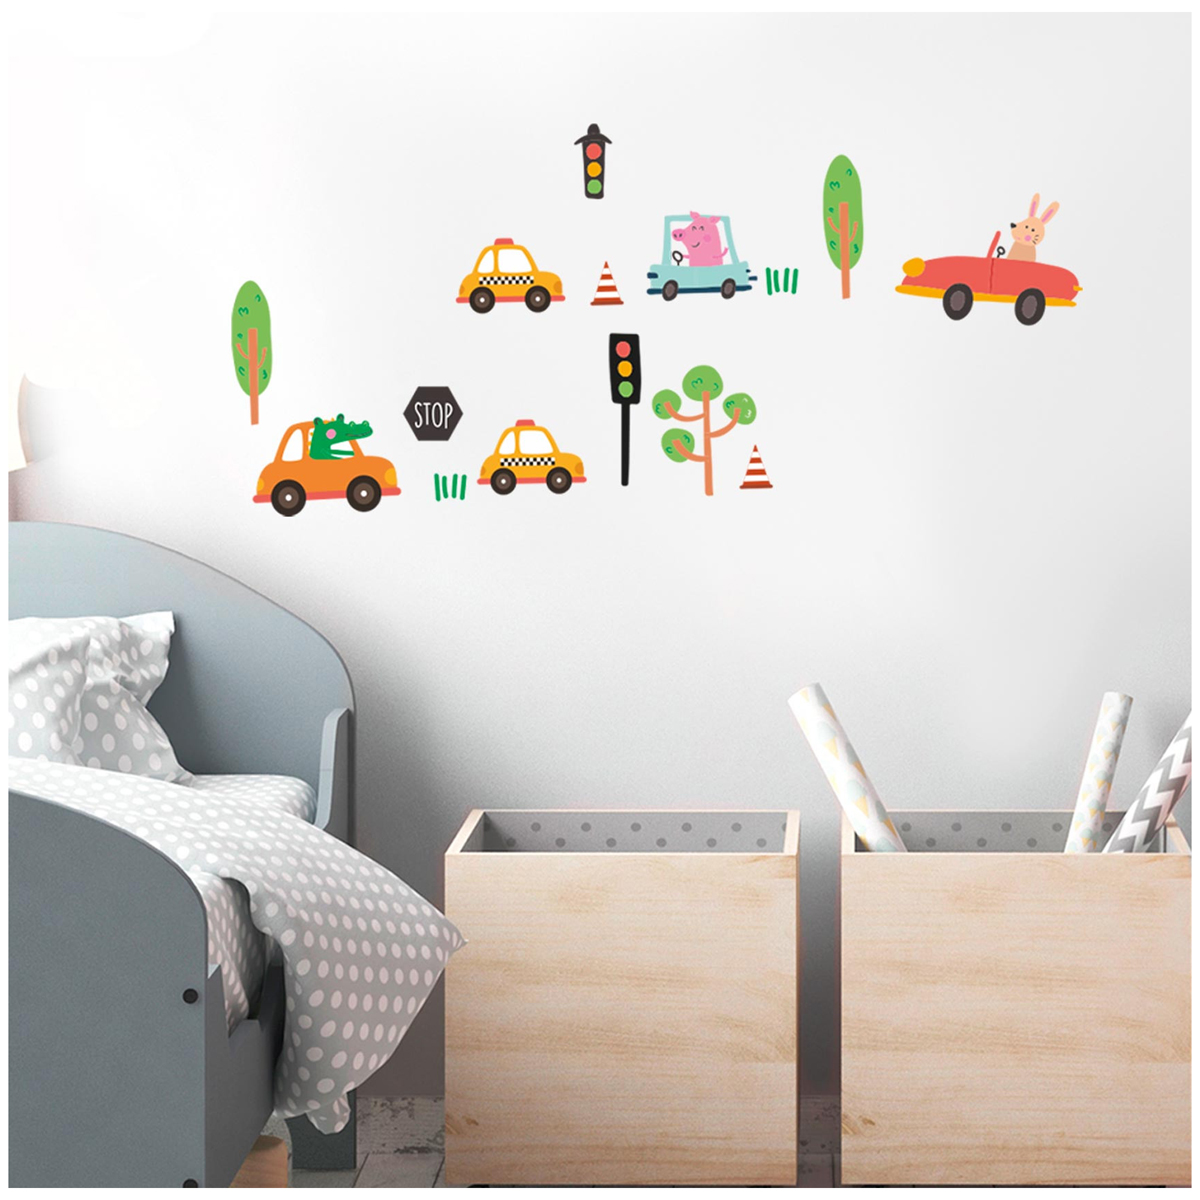 3 planche de stickers \'Voitures\' vert orange - 30x13 cm - [R3416]